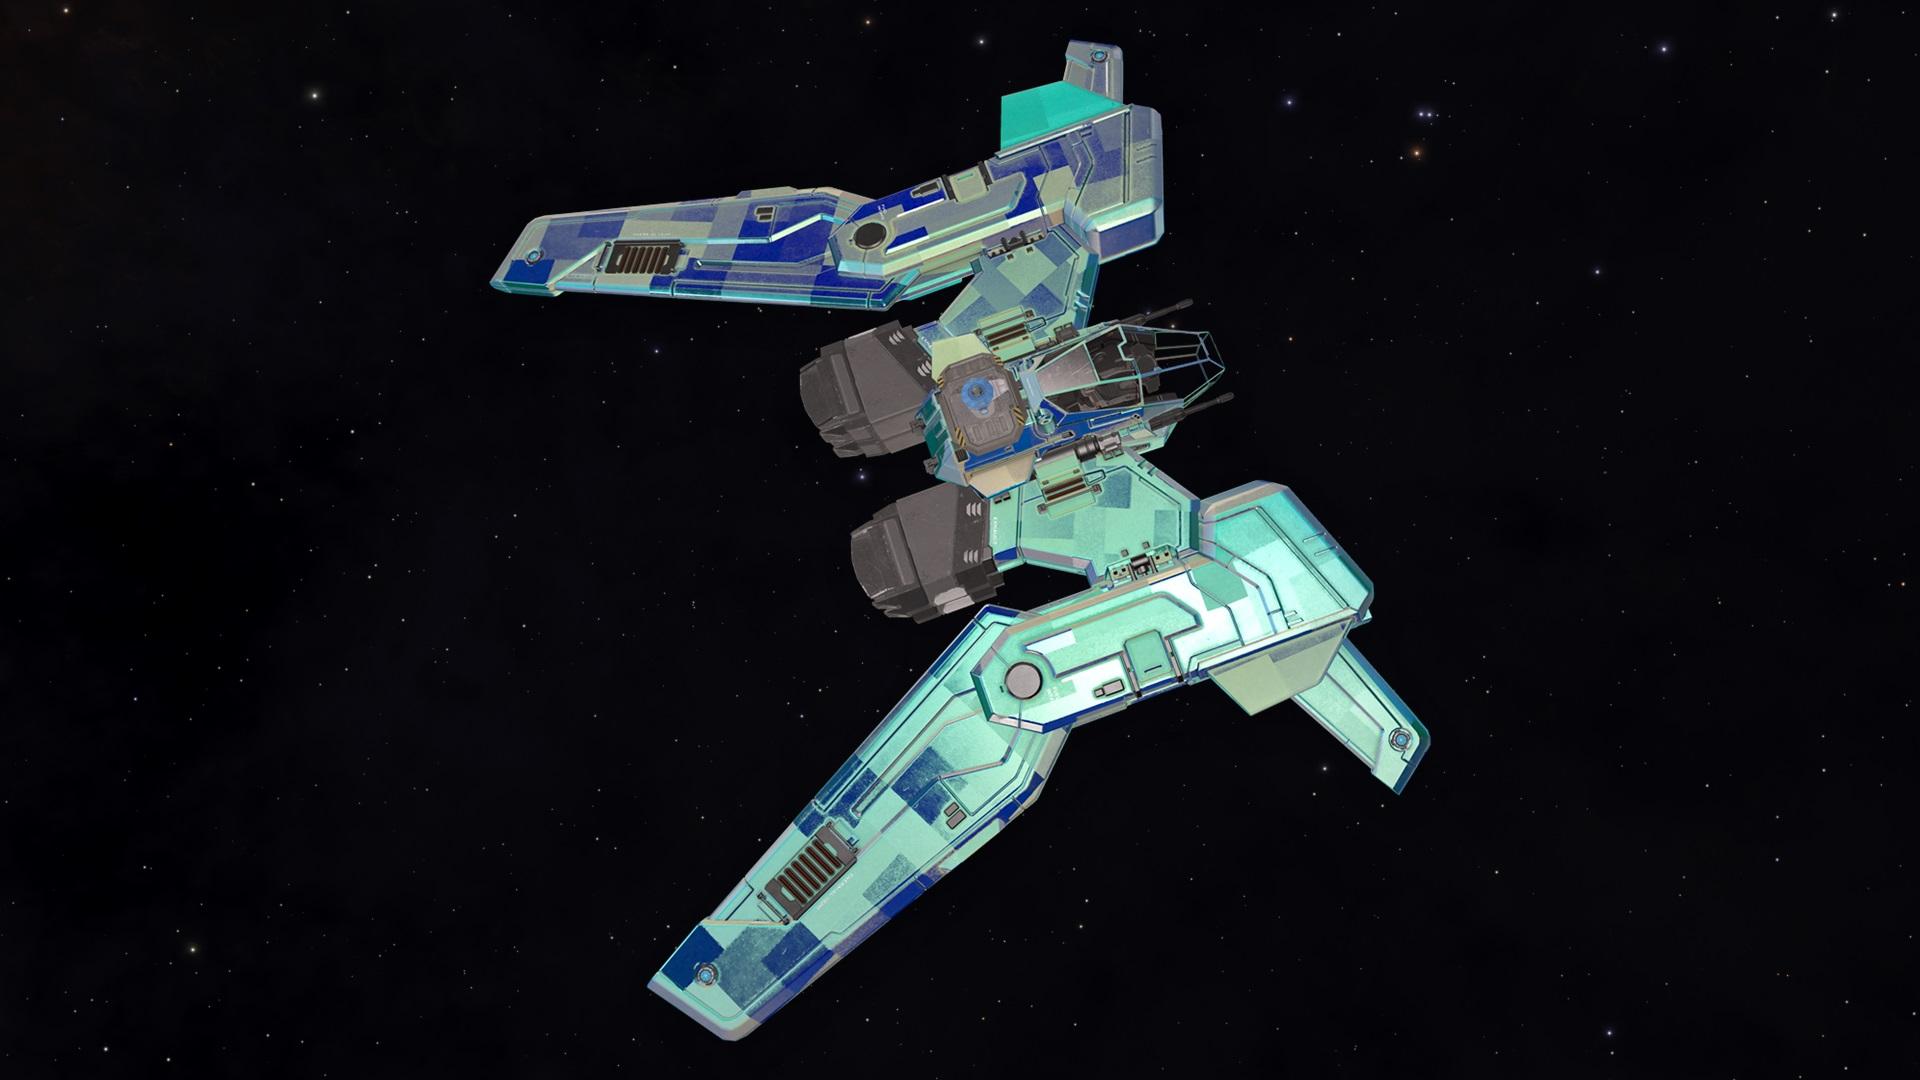 Ind_Fighter_LRPO_Azure_Stars_1920.jpg